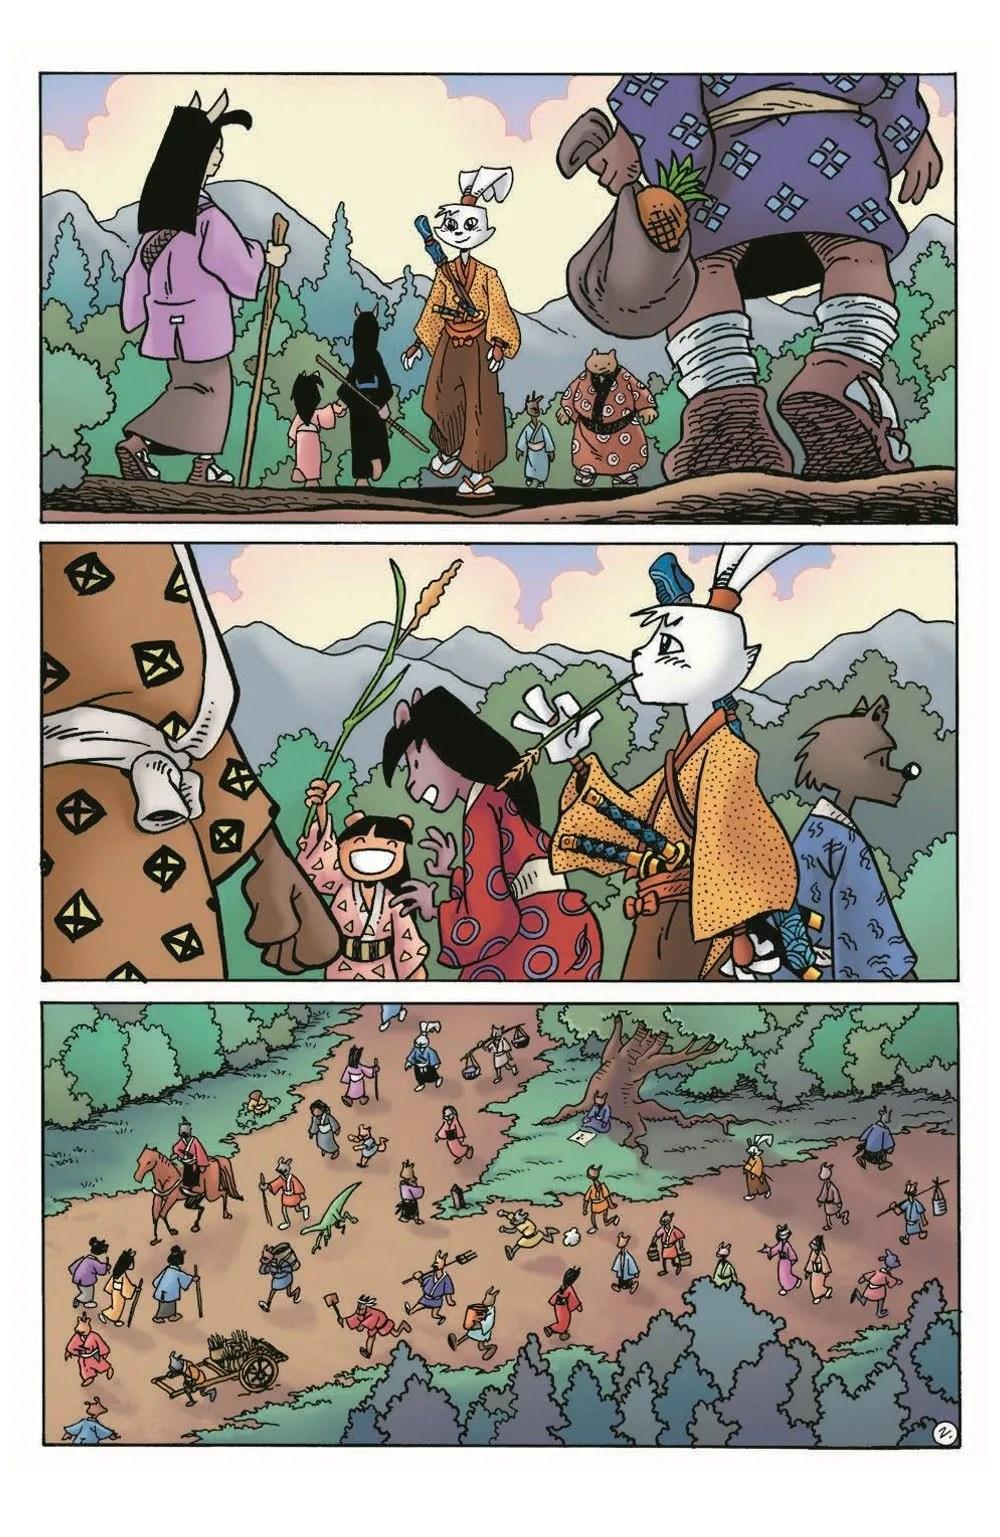 Usagi20_pr-4 ComicList Previews: USAGI YOJIMBO #20